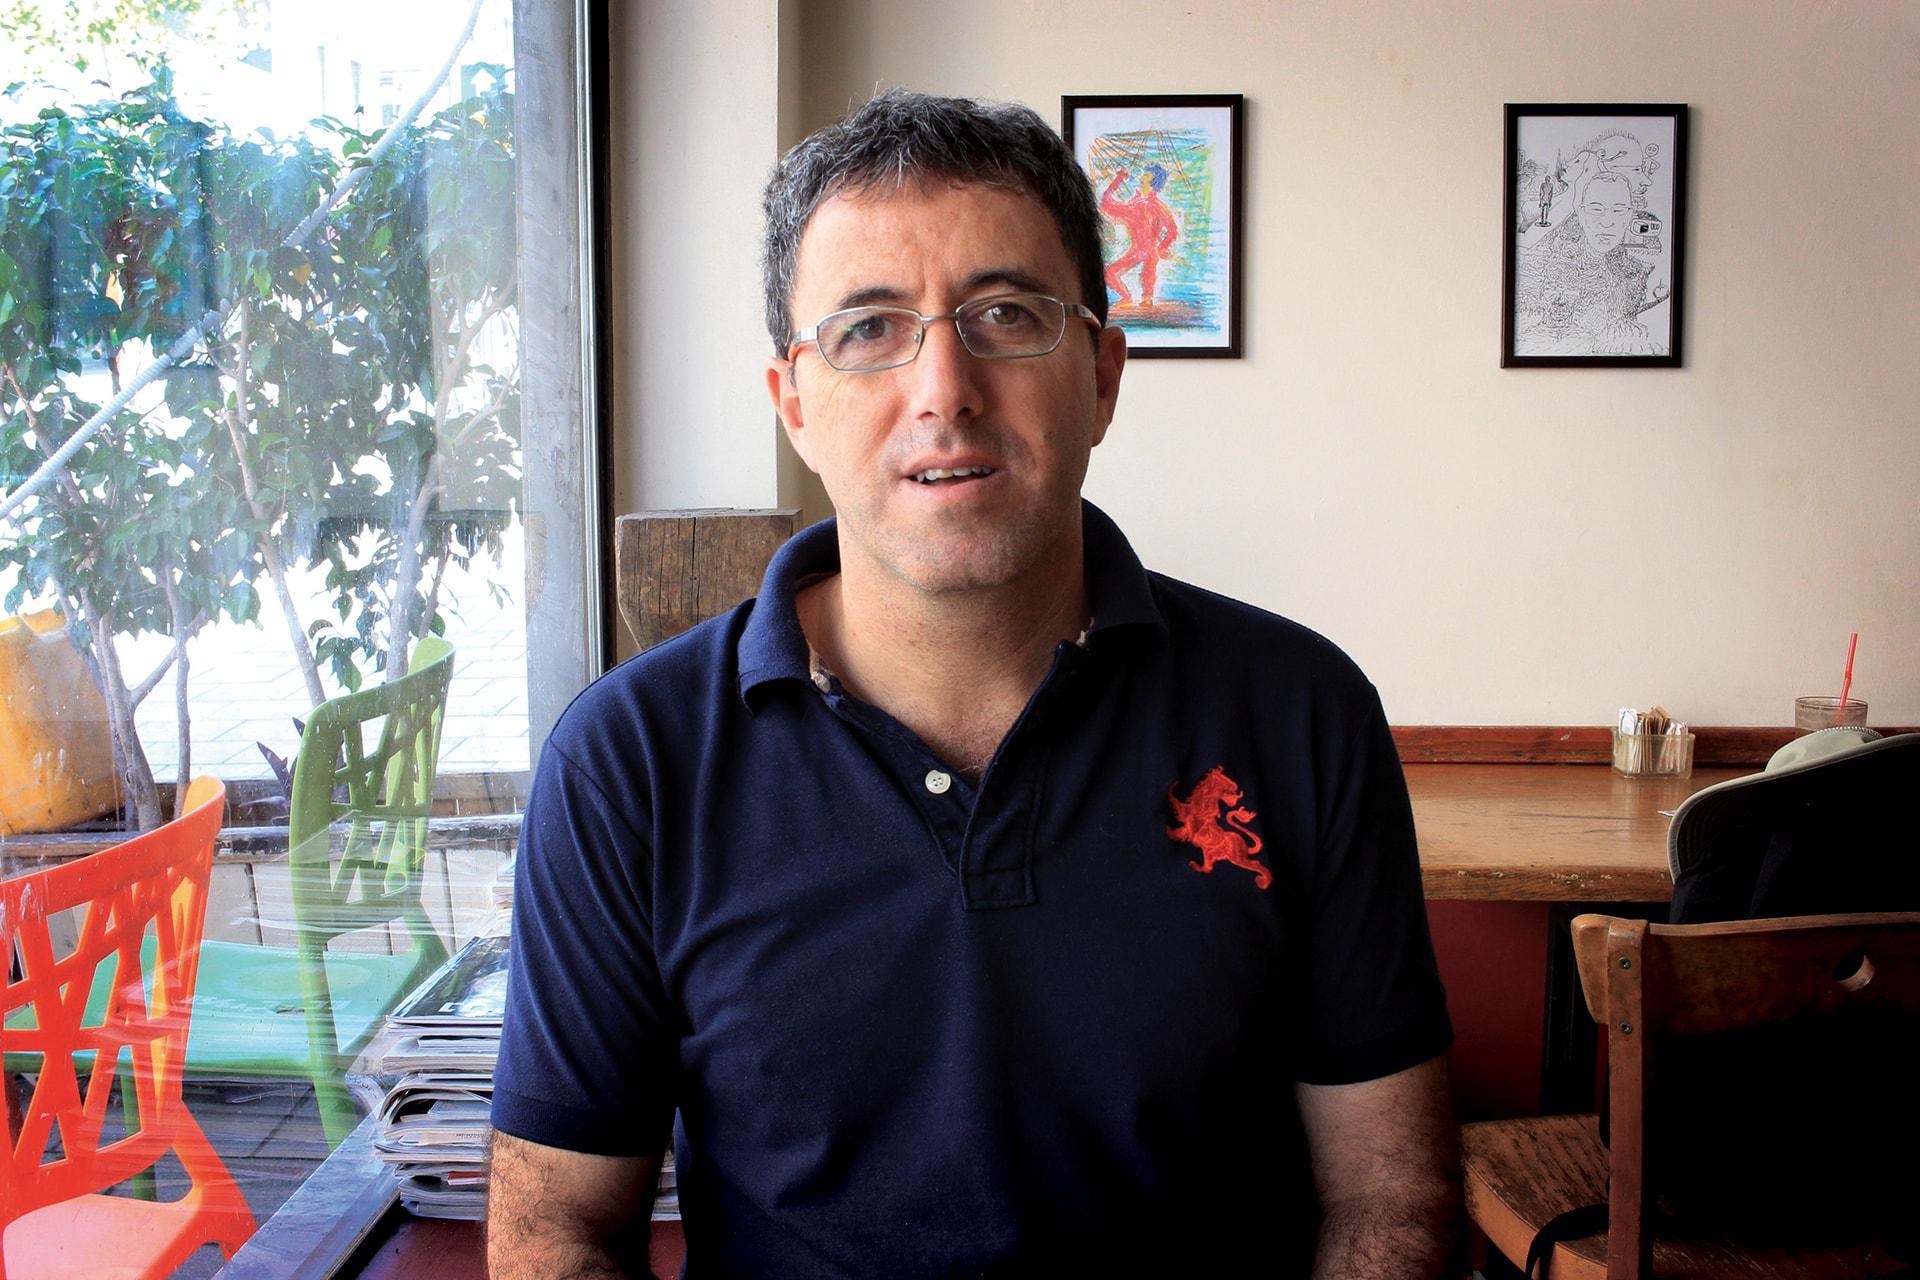 Gidon Bromberg, Israeli Director, Eco-Peace Middle East © Eco-Peace